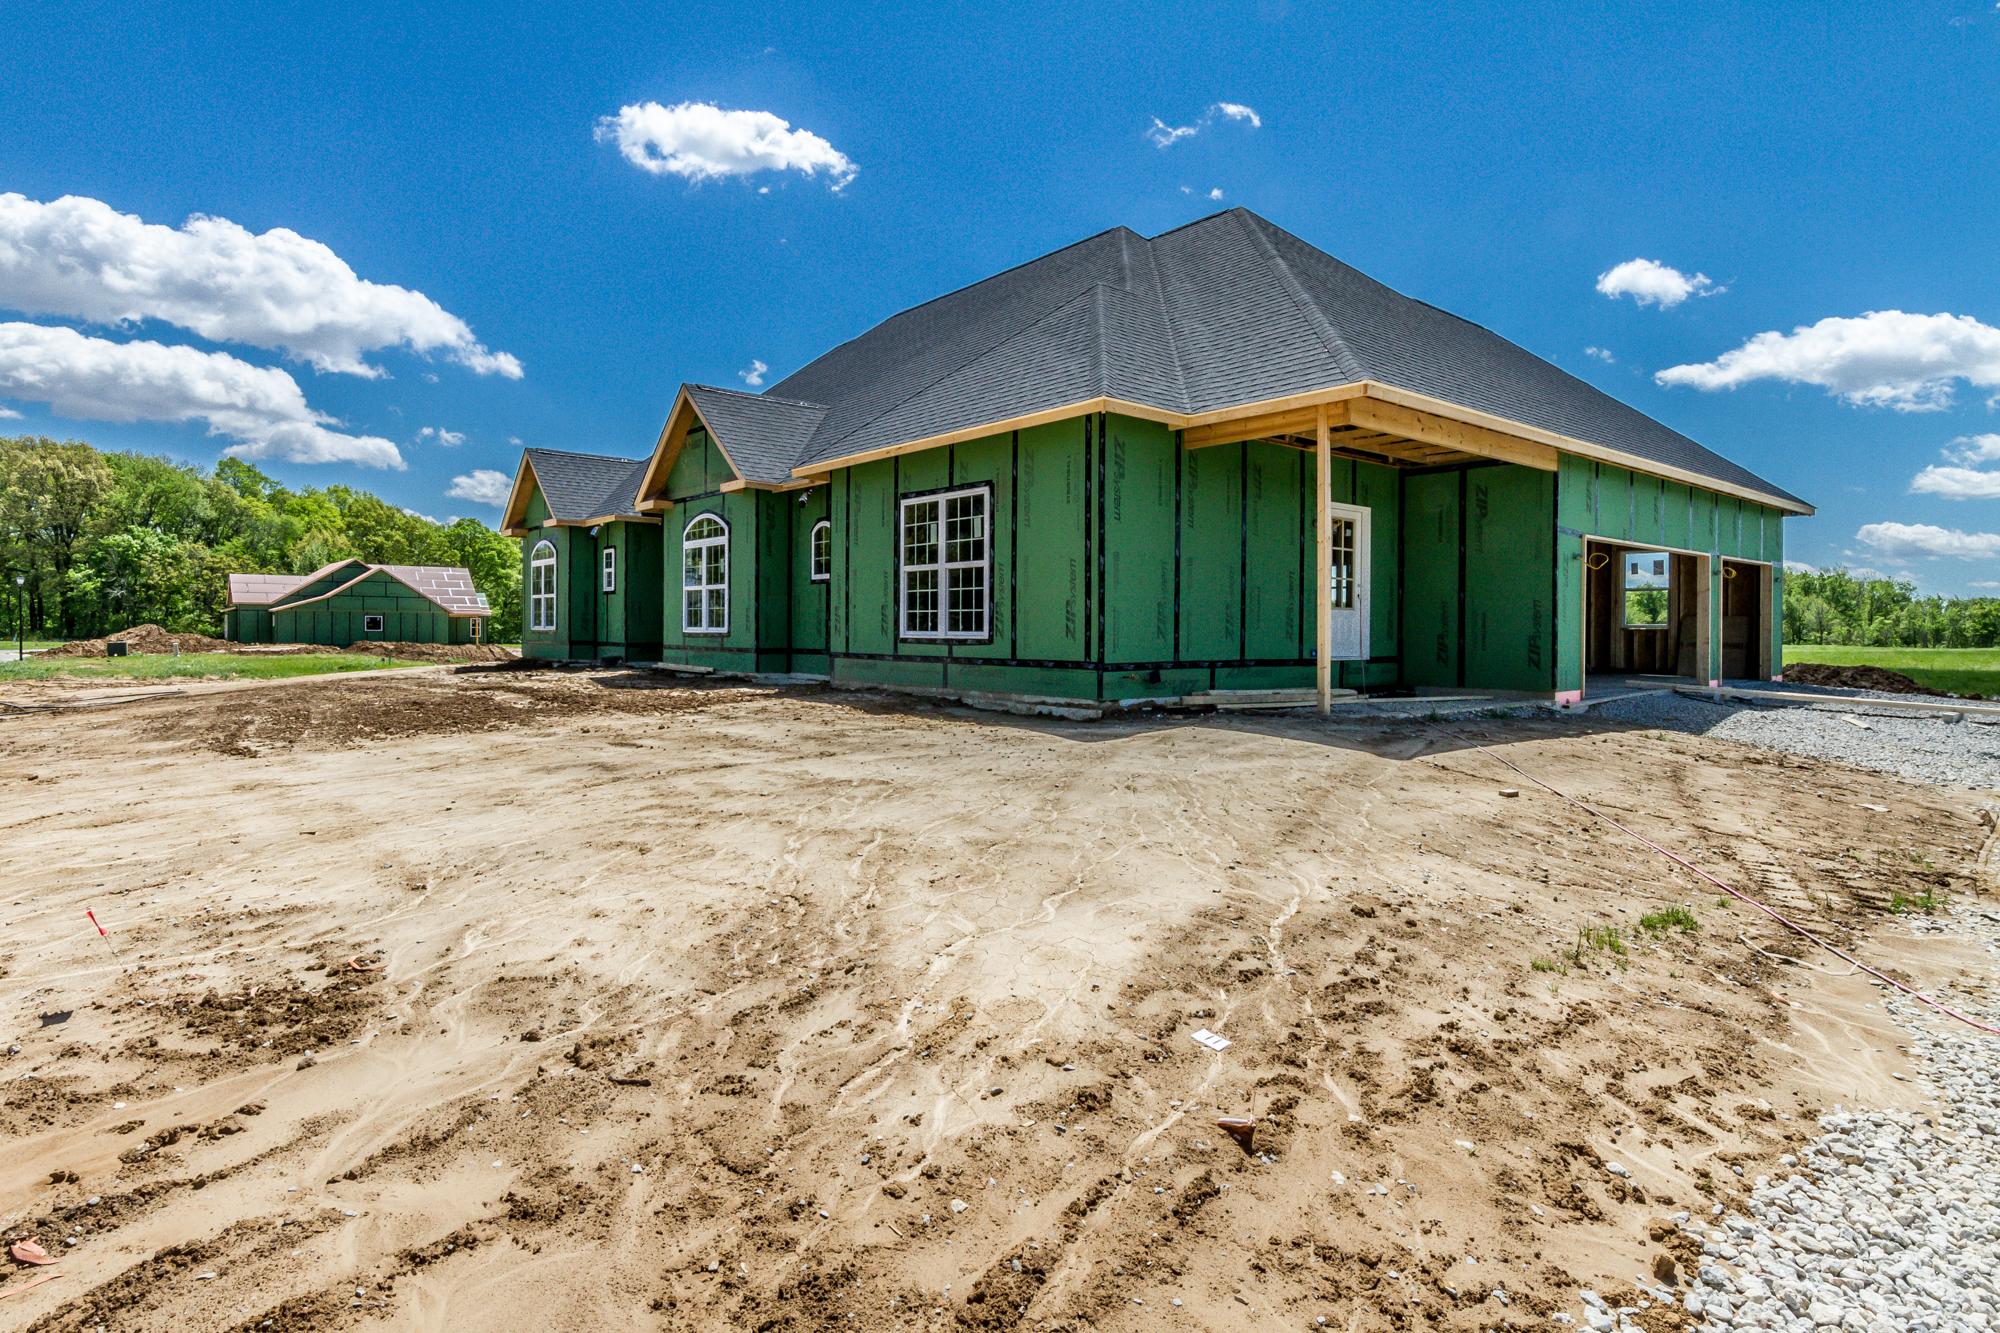 Bethel_Ridge_Farms_O'Fallon_Illinois_Progress_5.3.17-10.jpg